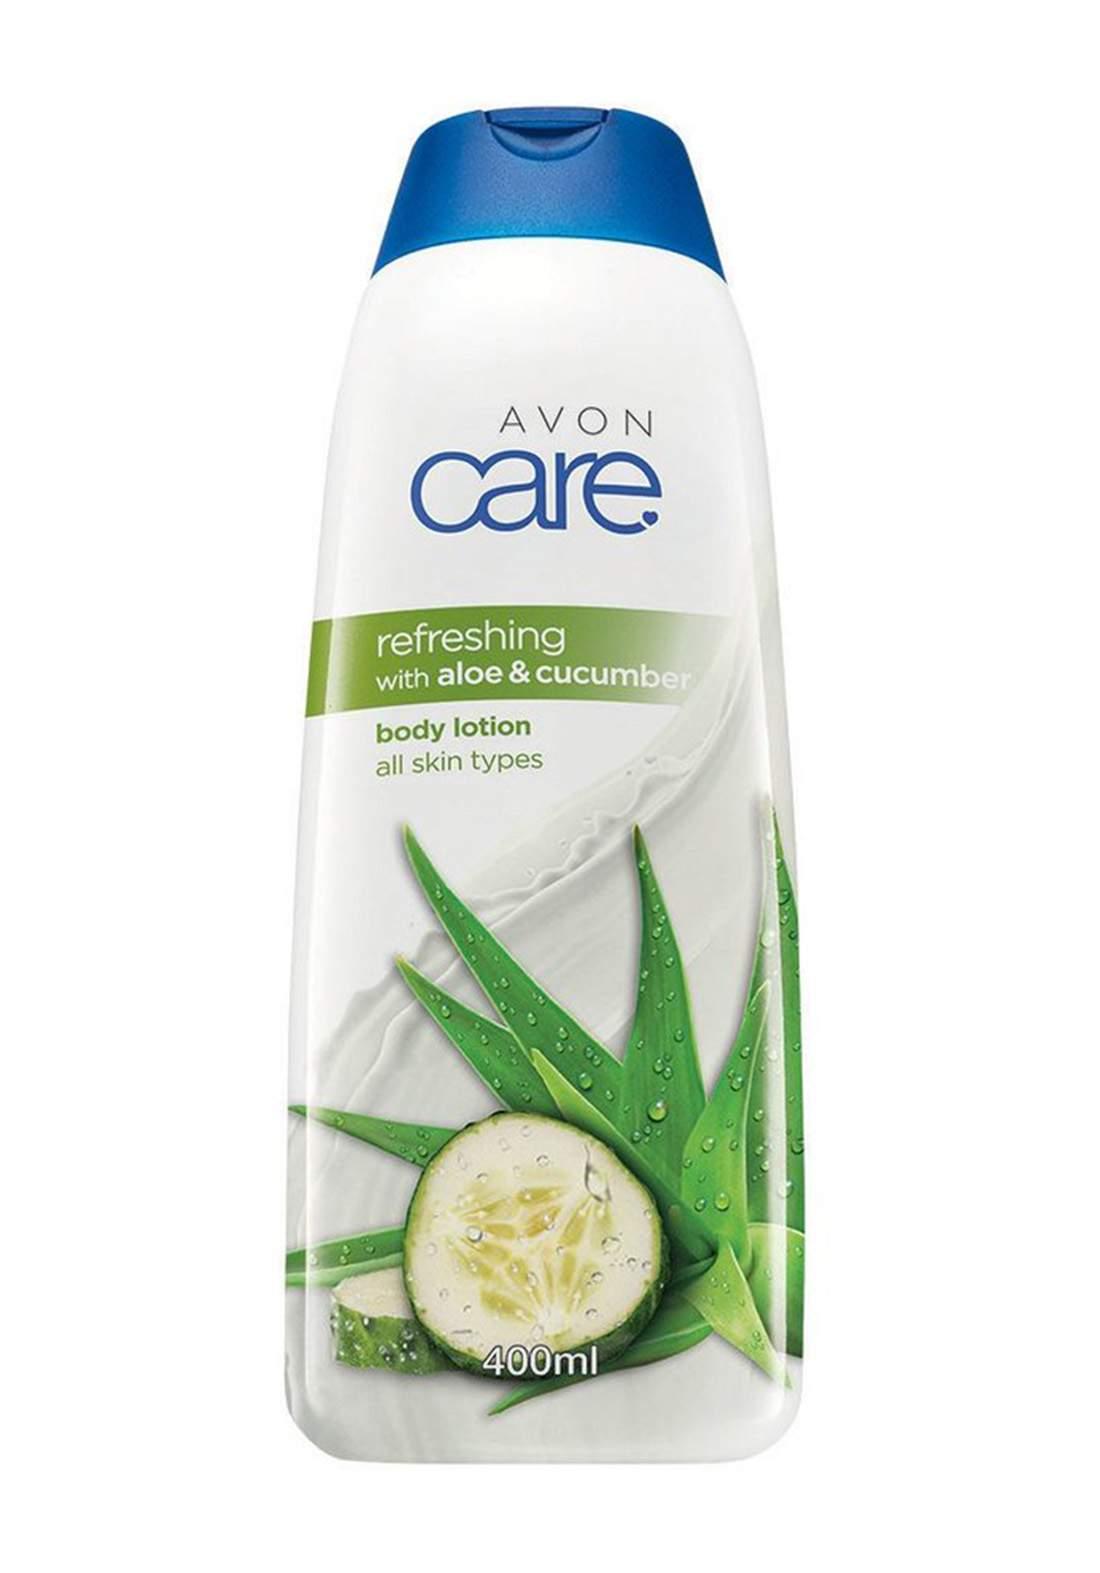 Avon 1292593 Care Refreshing with Aloe & Cucumber Body Lotion 400 ml كريم ترطيب للجسم